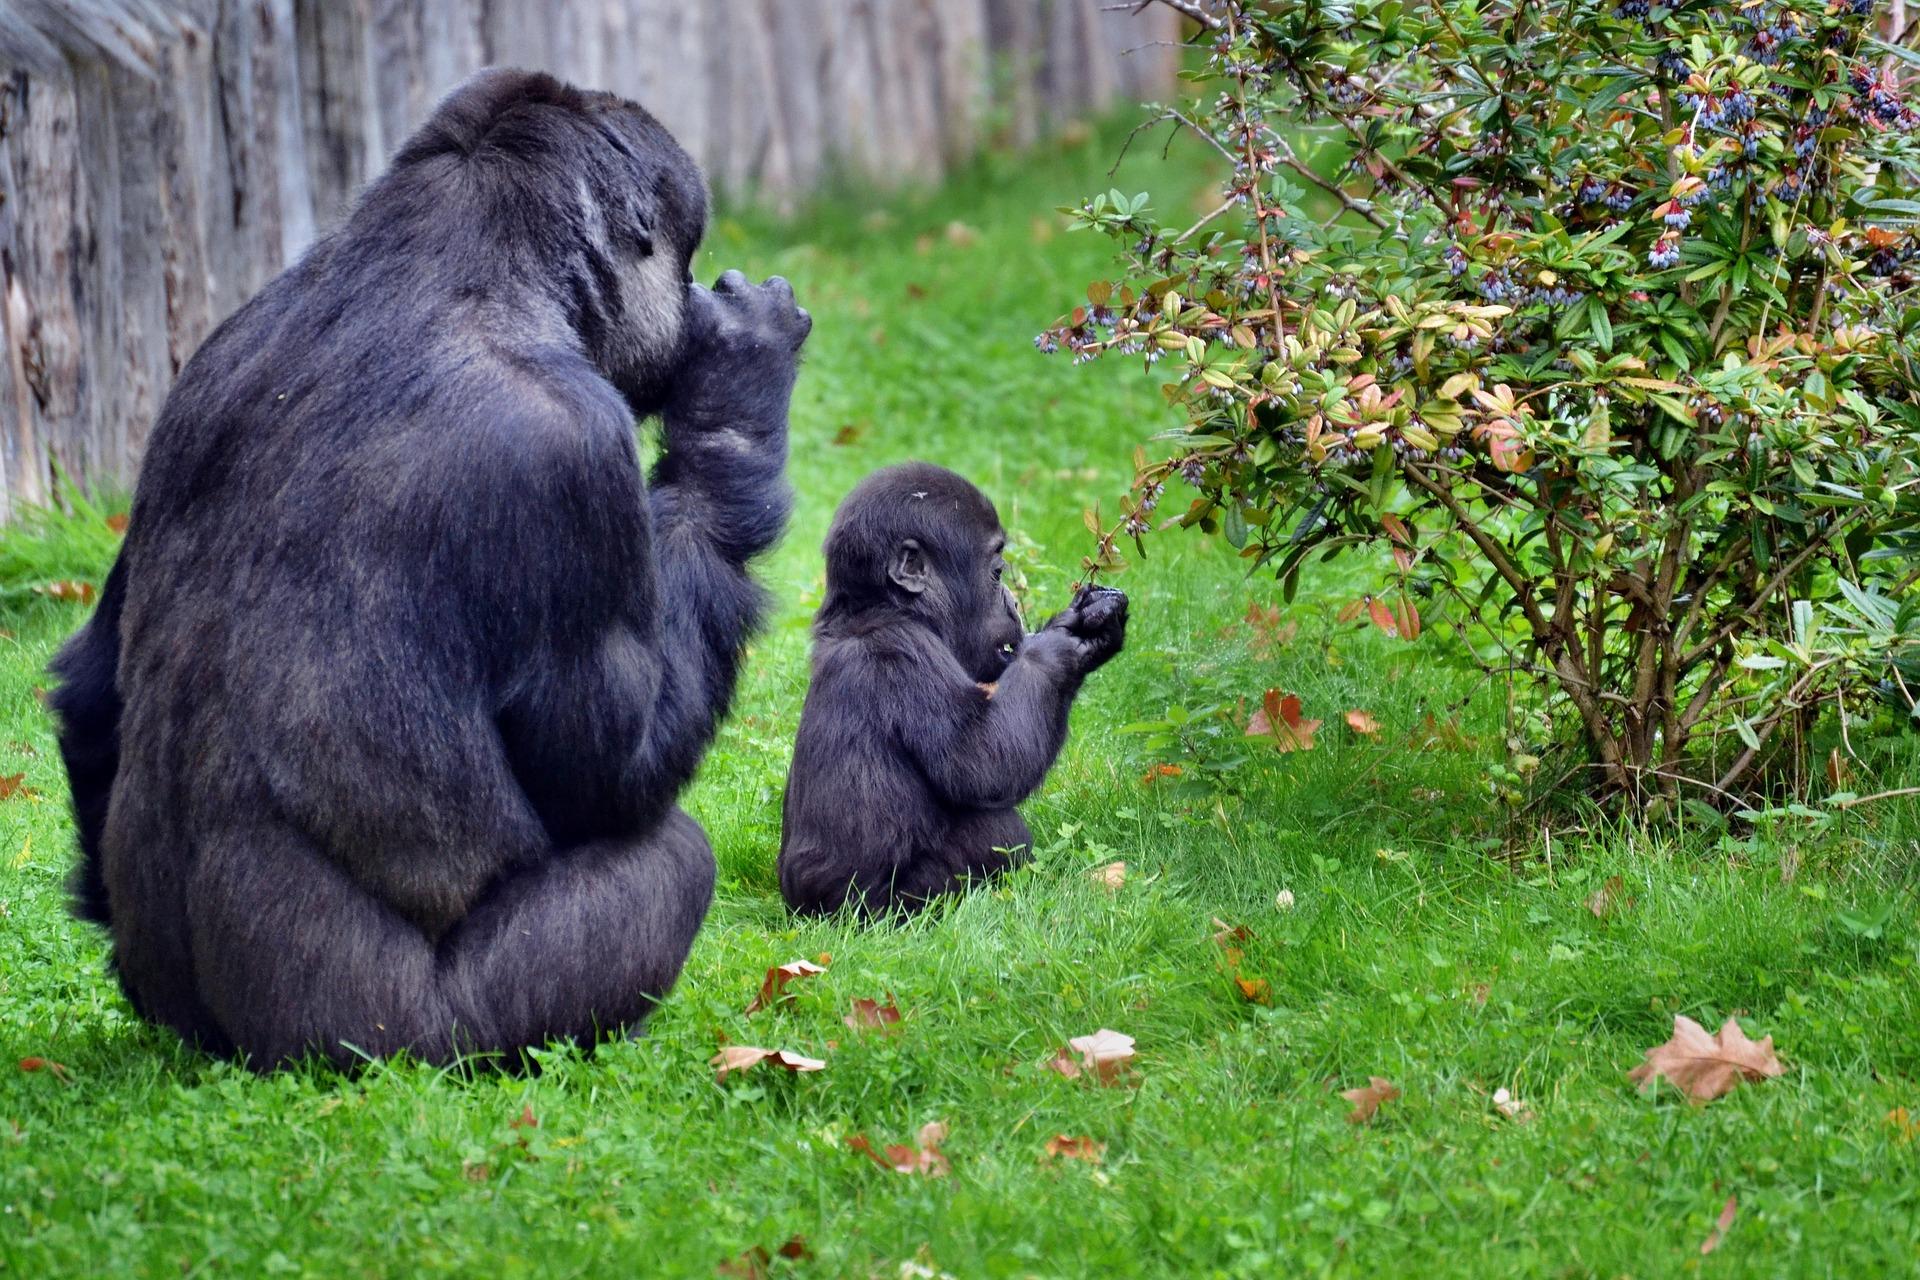 Mother and Baby Gorillas at Park, Rwanda